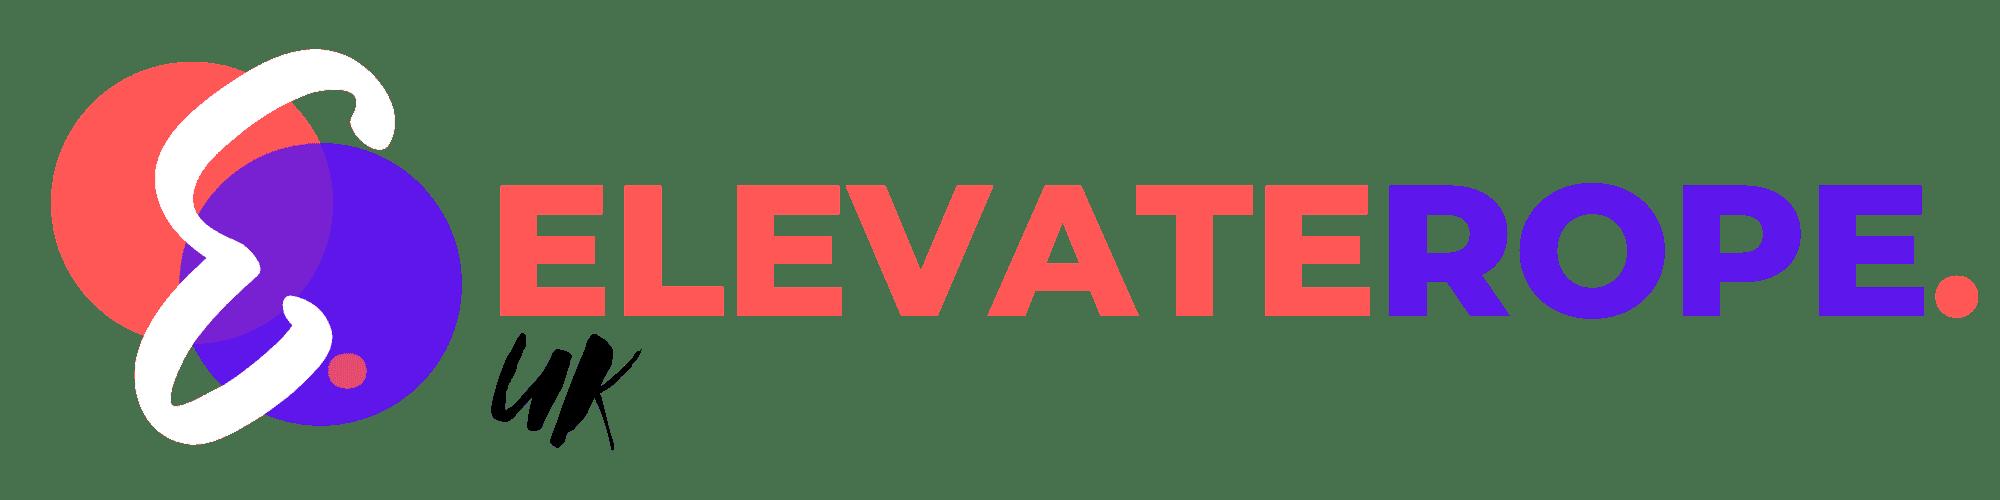 Elevate rope uk